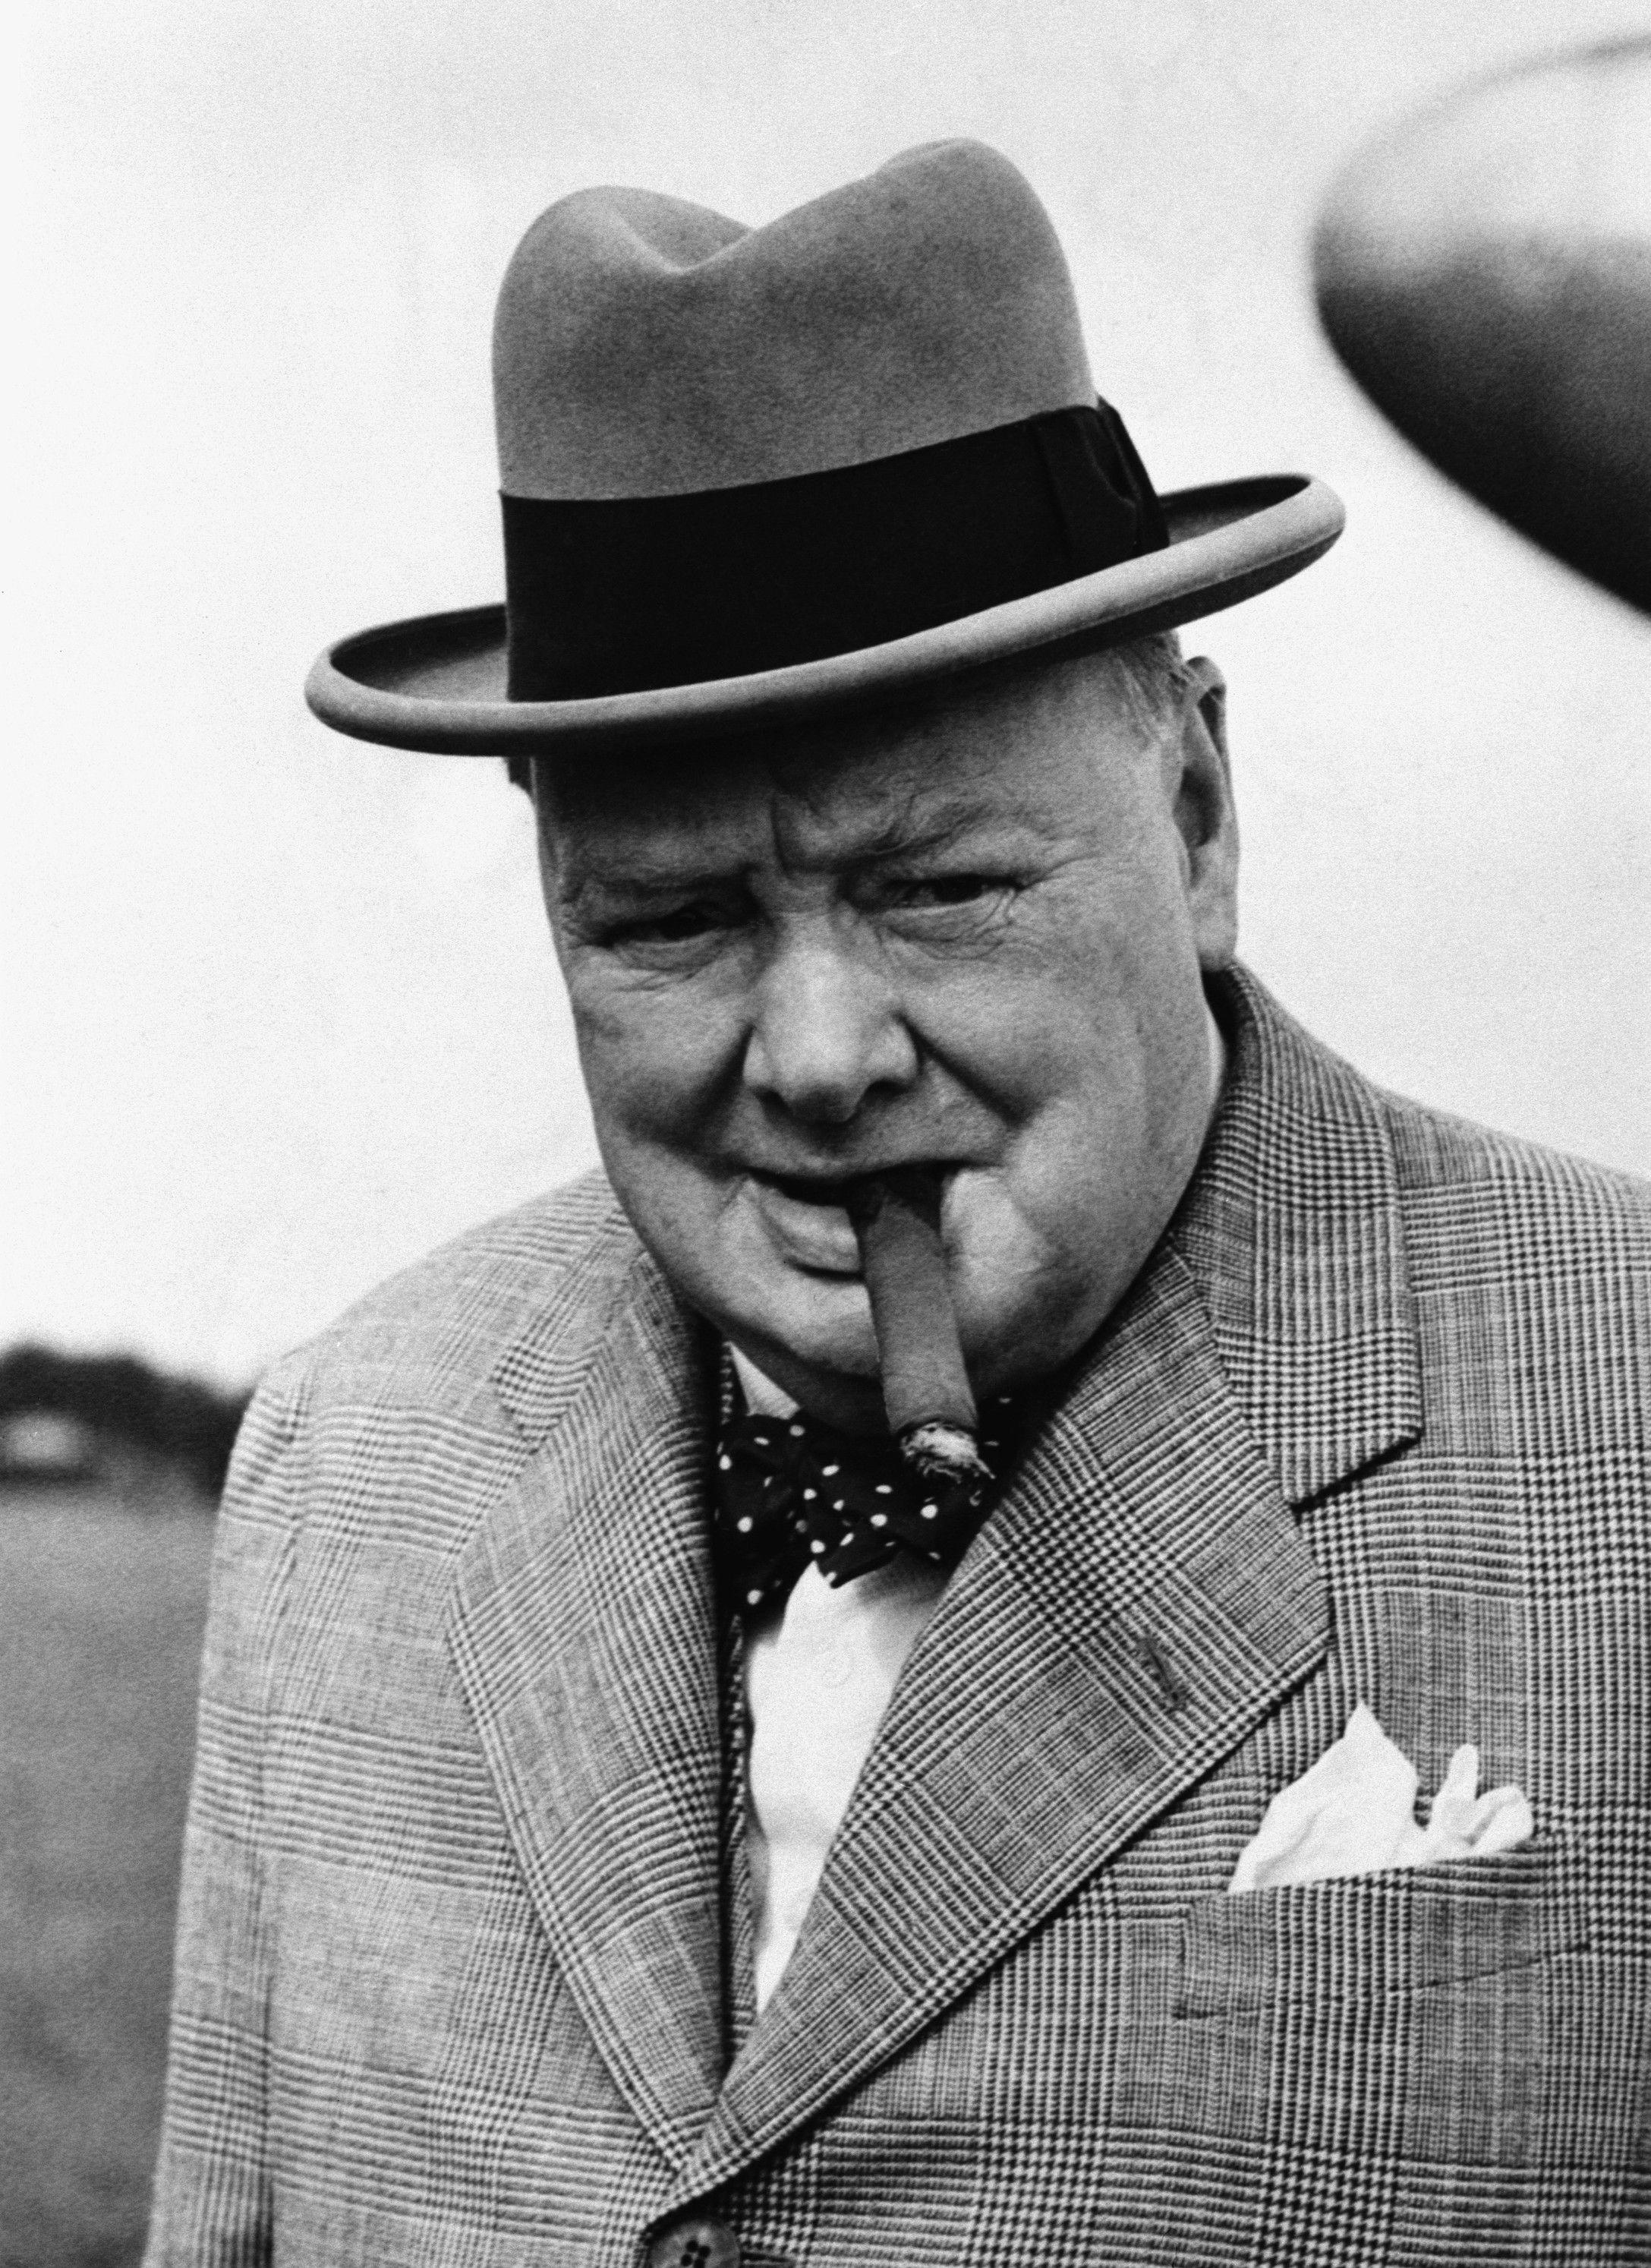 Citaten Churchill : Churchill smoking his famous cigar winston